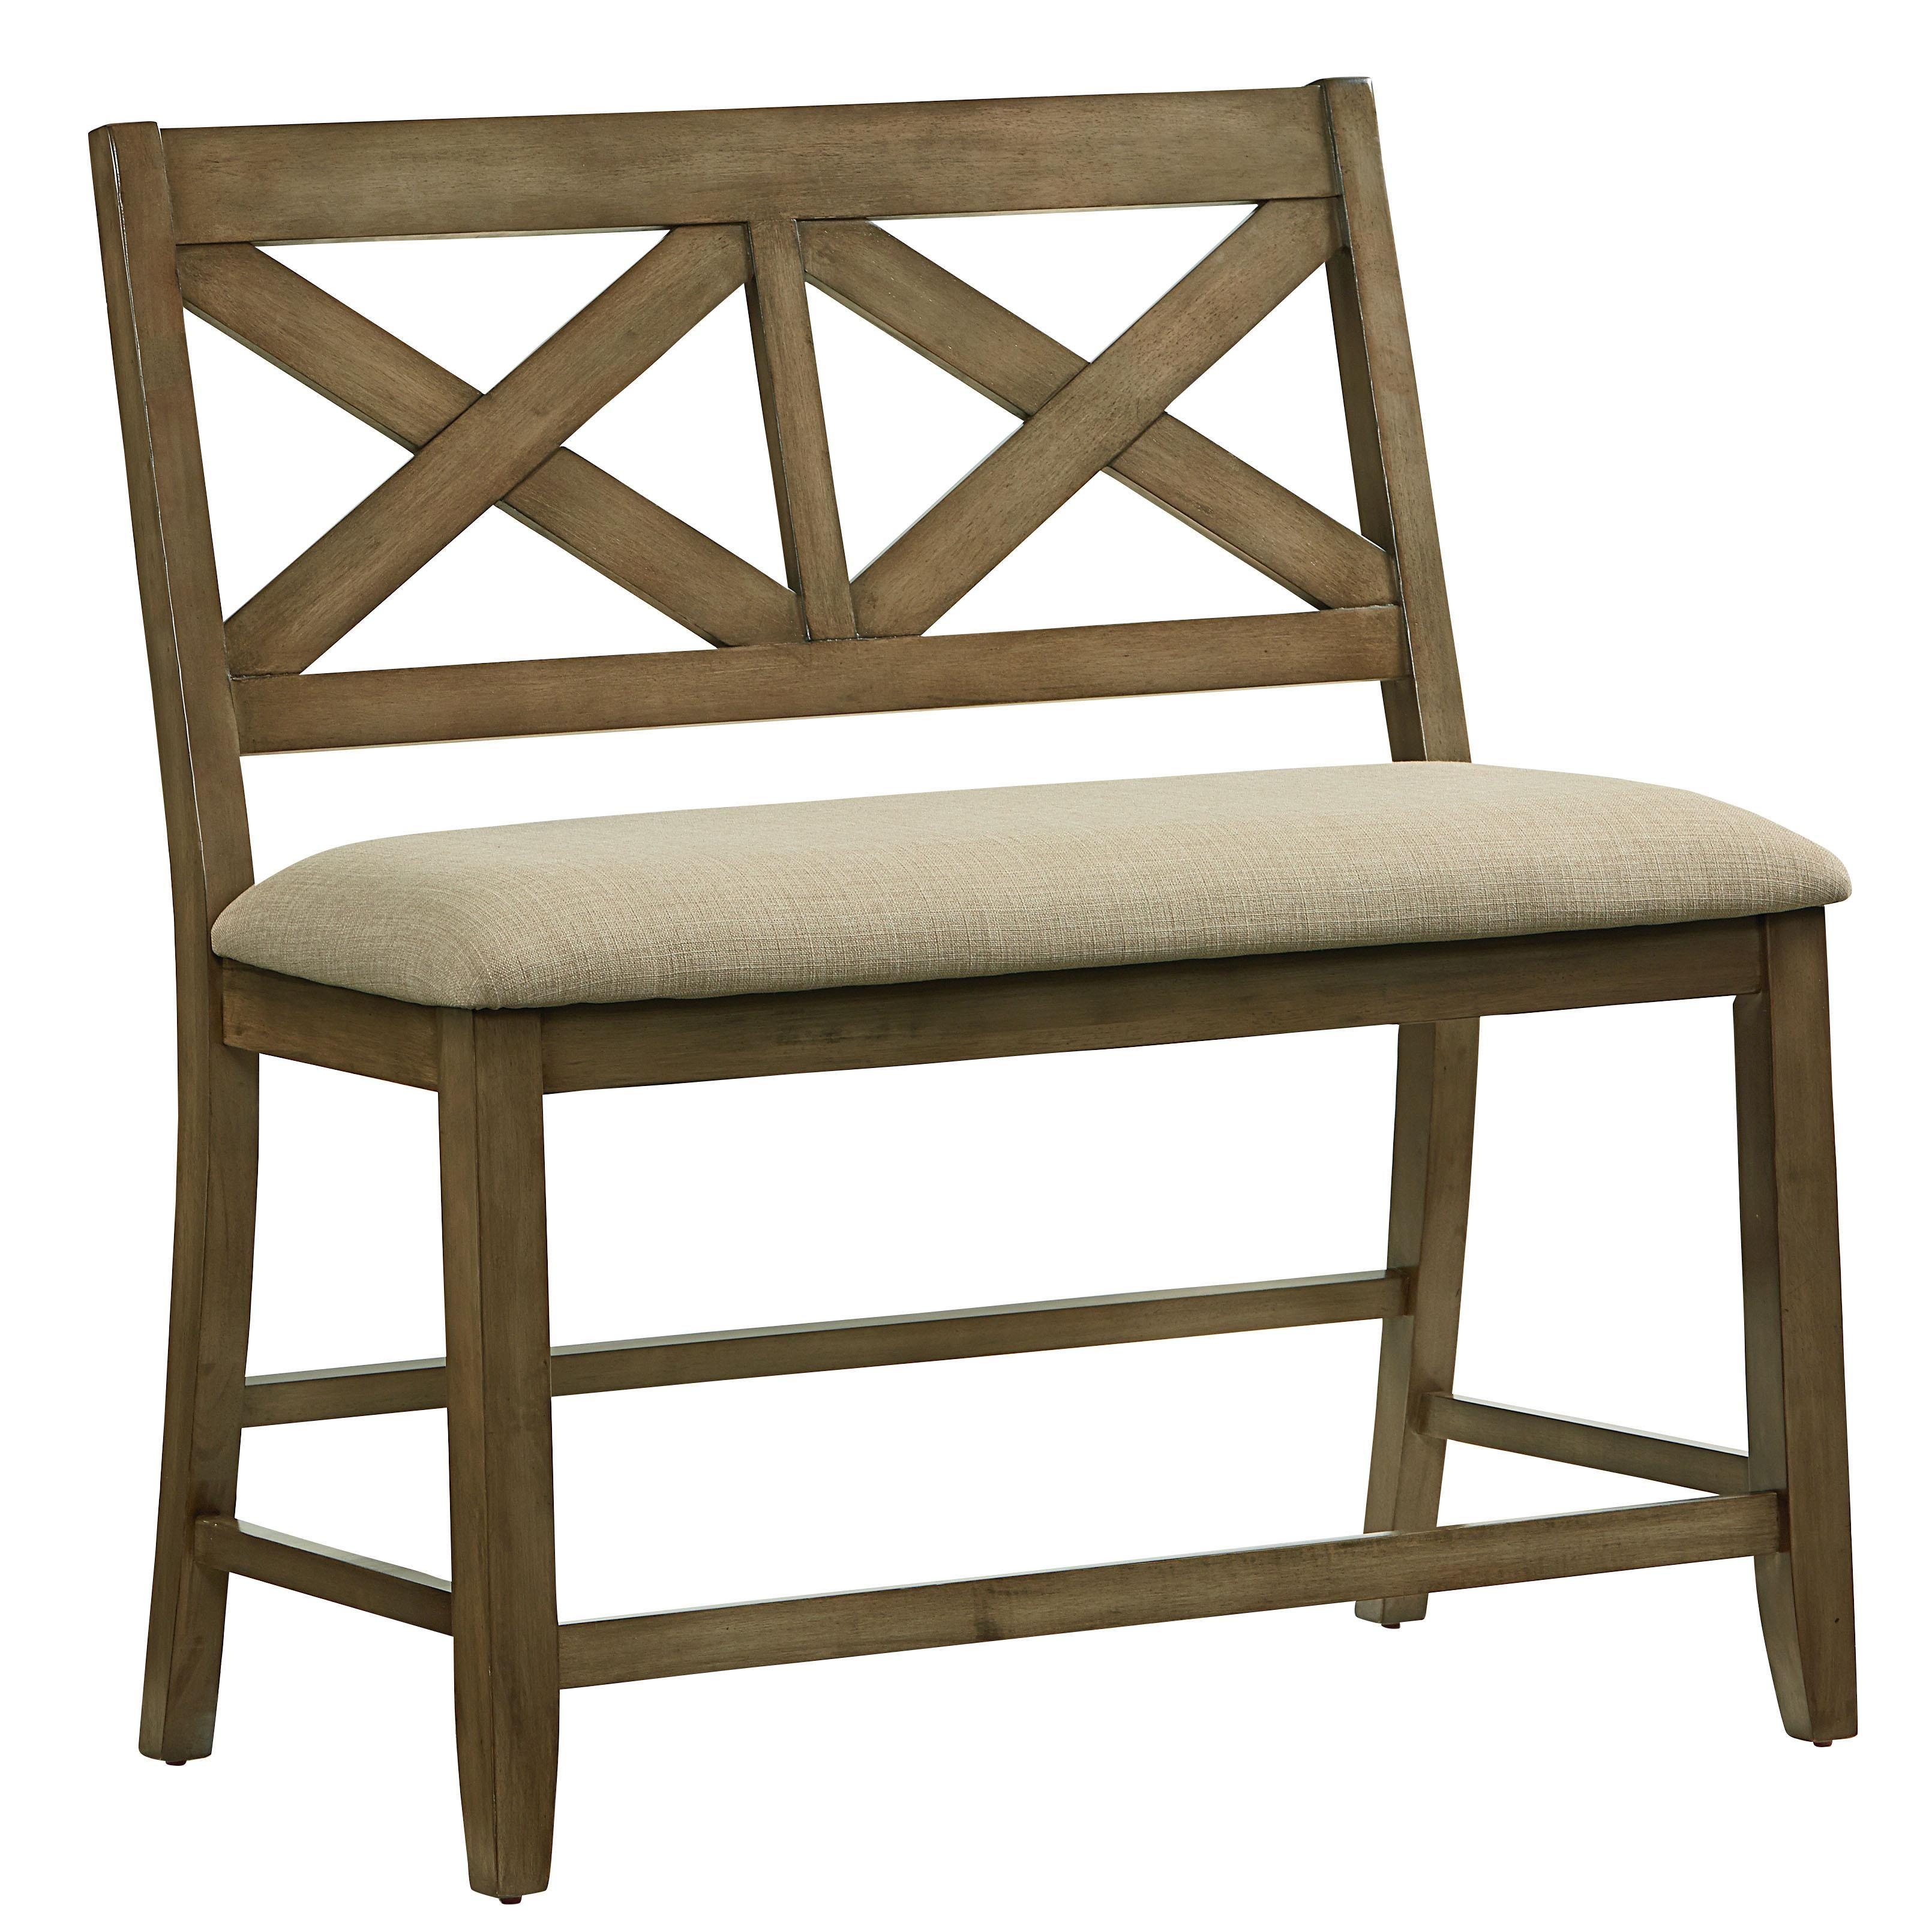 bench everythingbeauty walmart seat canada storage covers bar camo